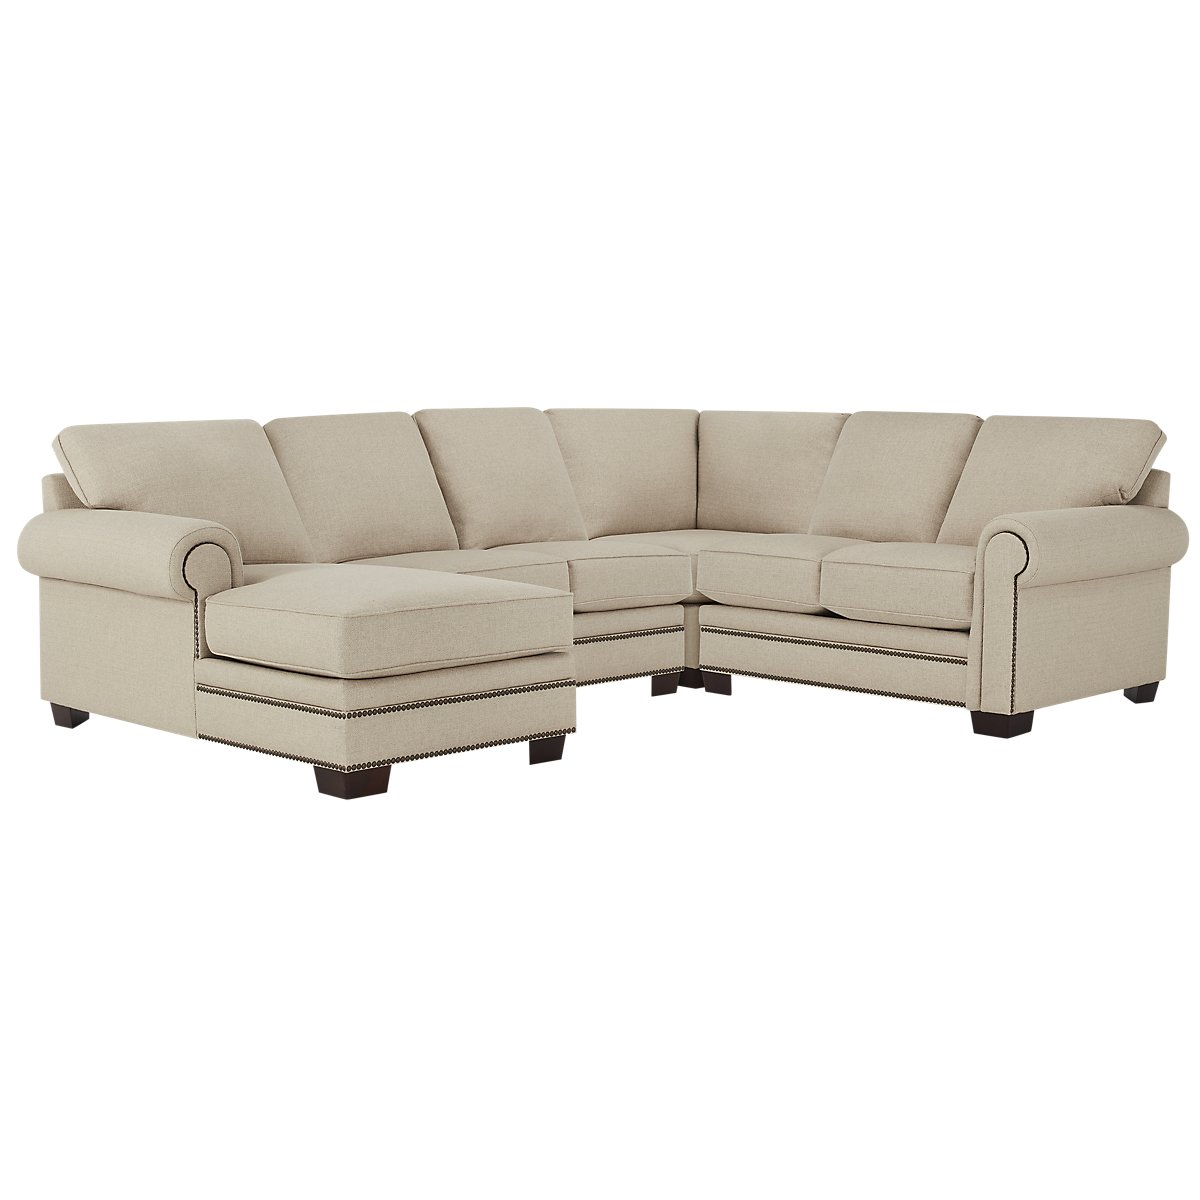 City furniture foster khaki fabric medium left chaise for Chaise kaki